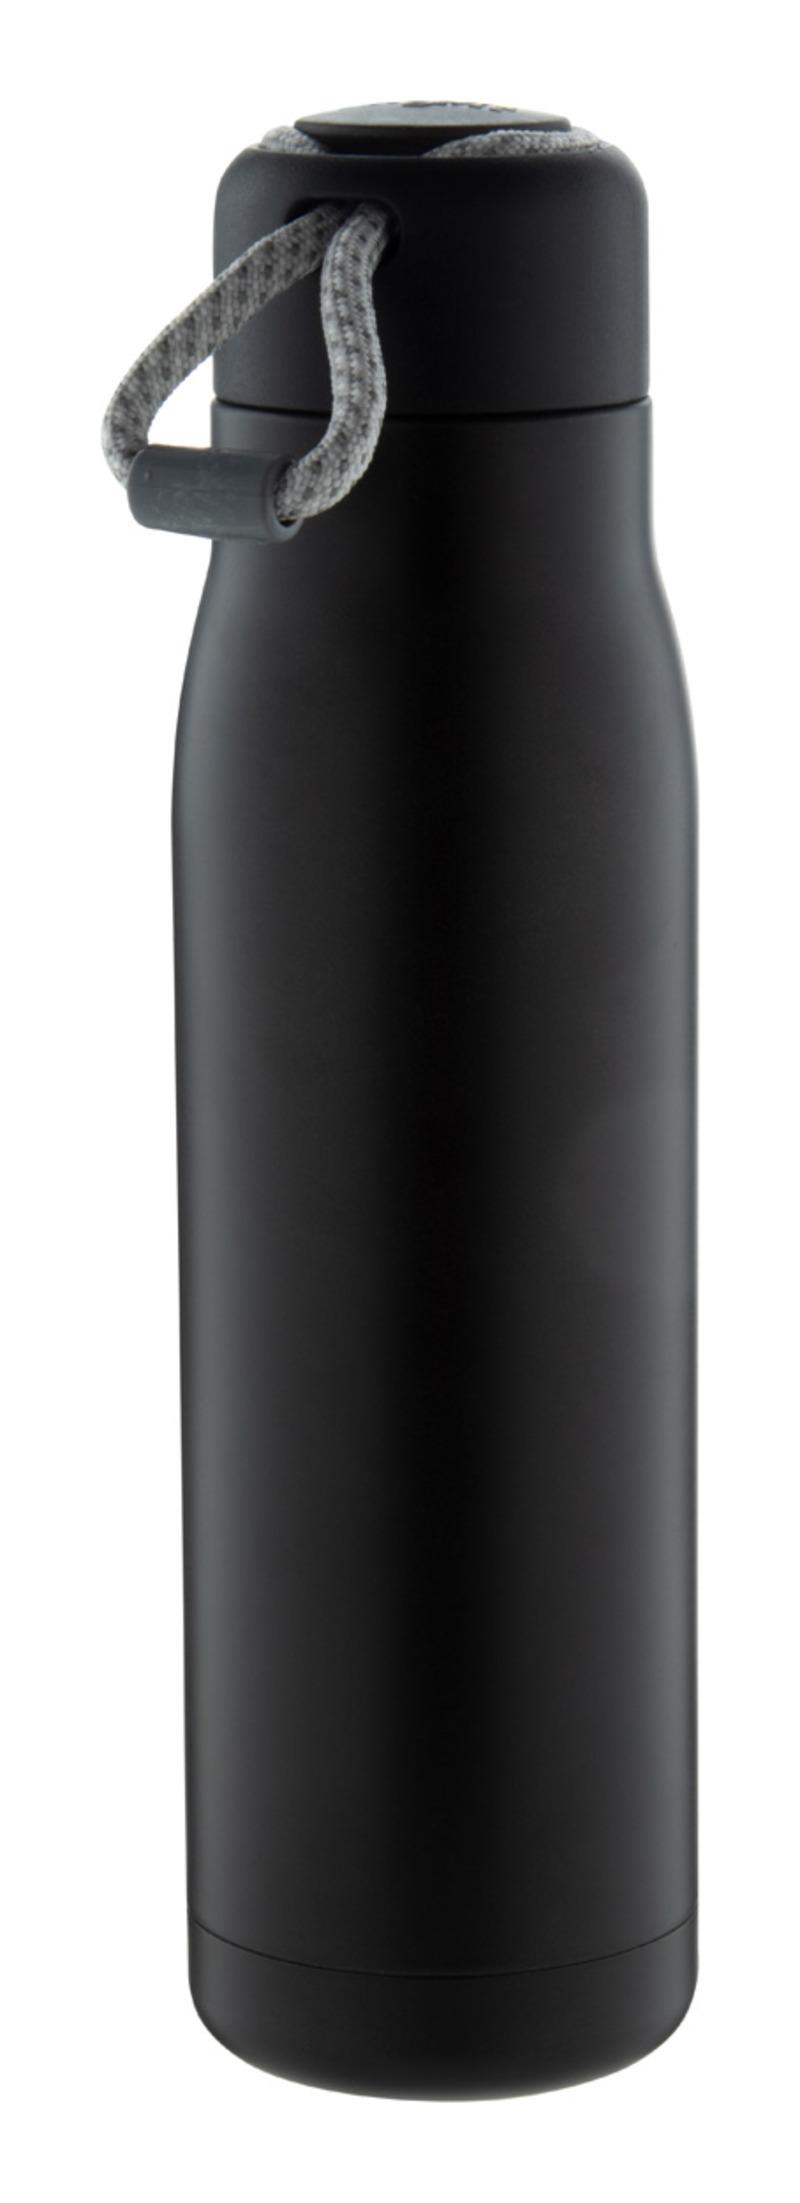 Makalu vacuum flask